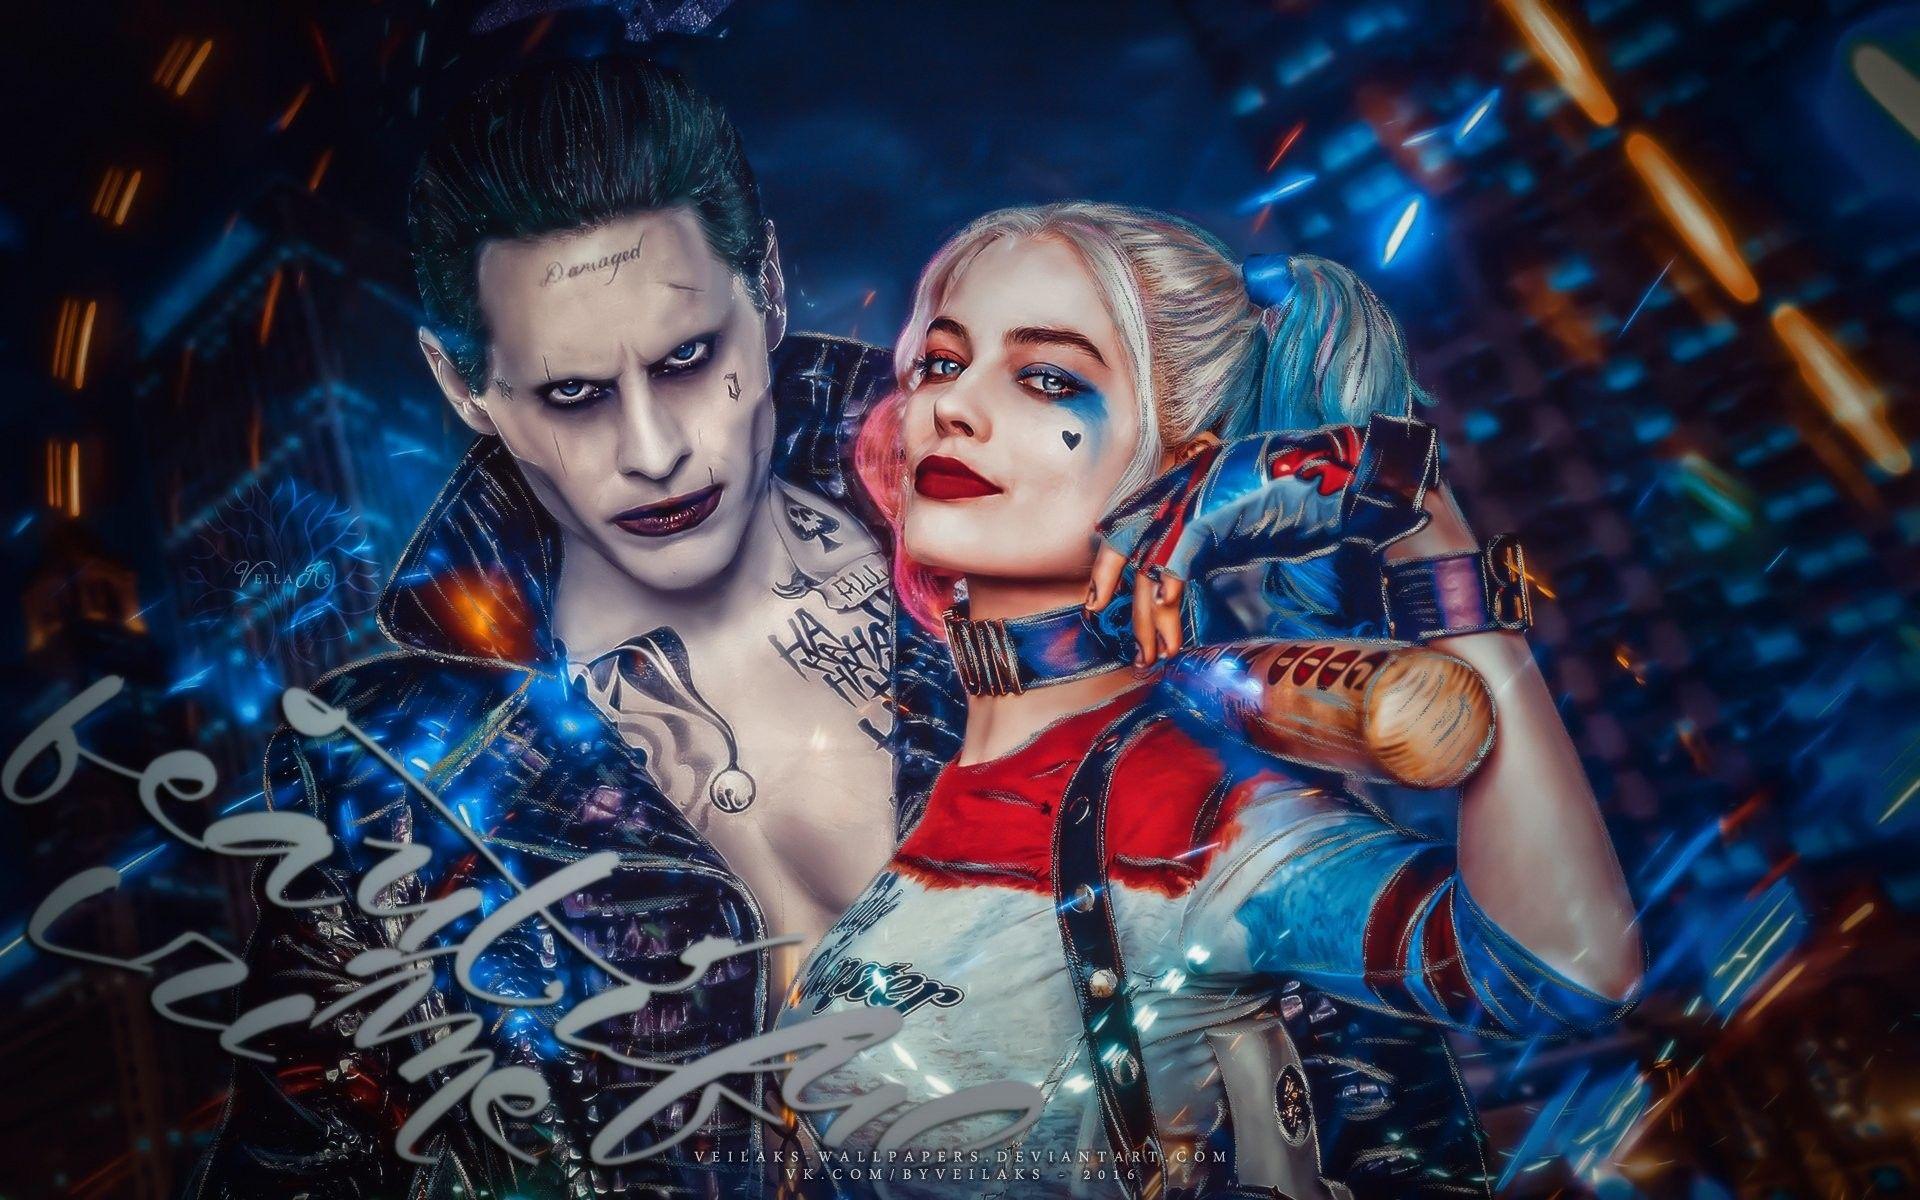 Pin Oleh Fabricio Assaf Di Joker And Harley Dc Comic Marvel Kawaii